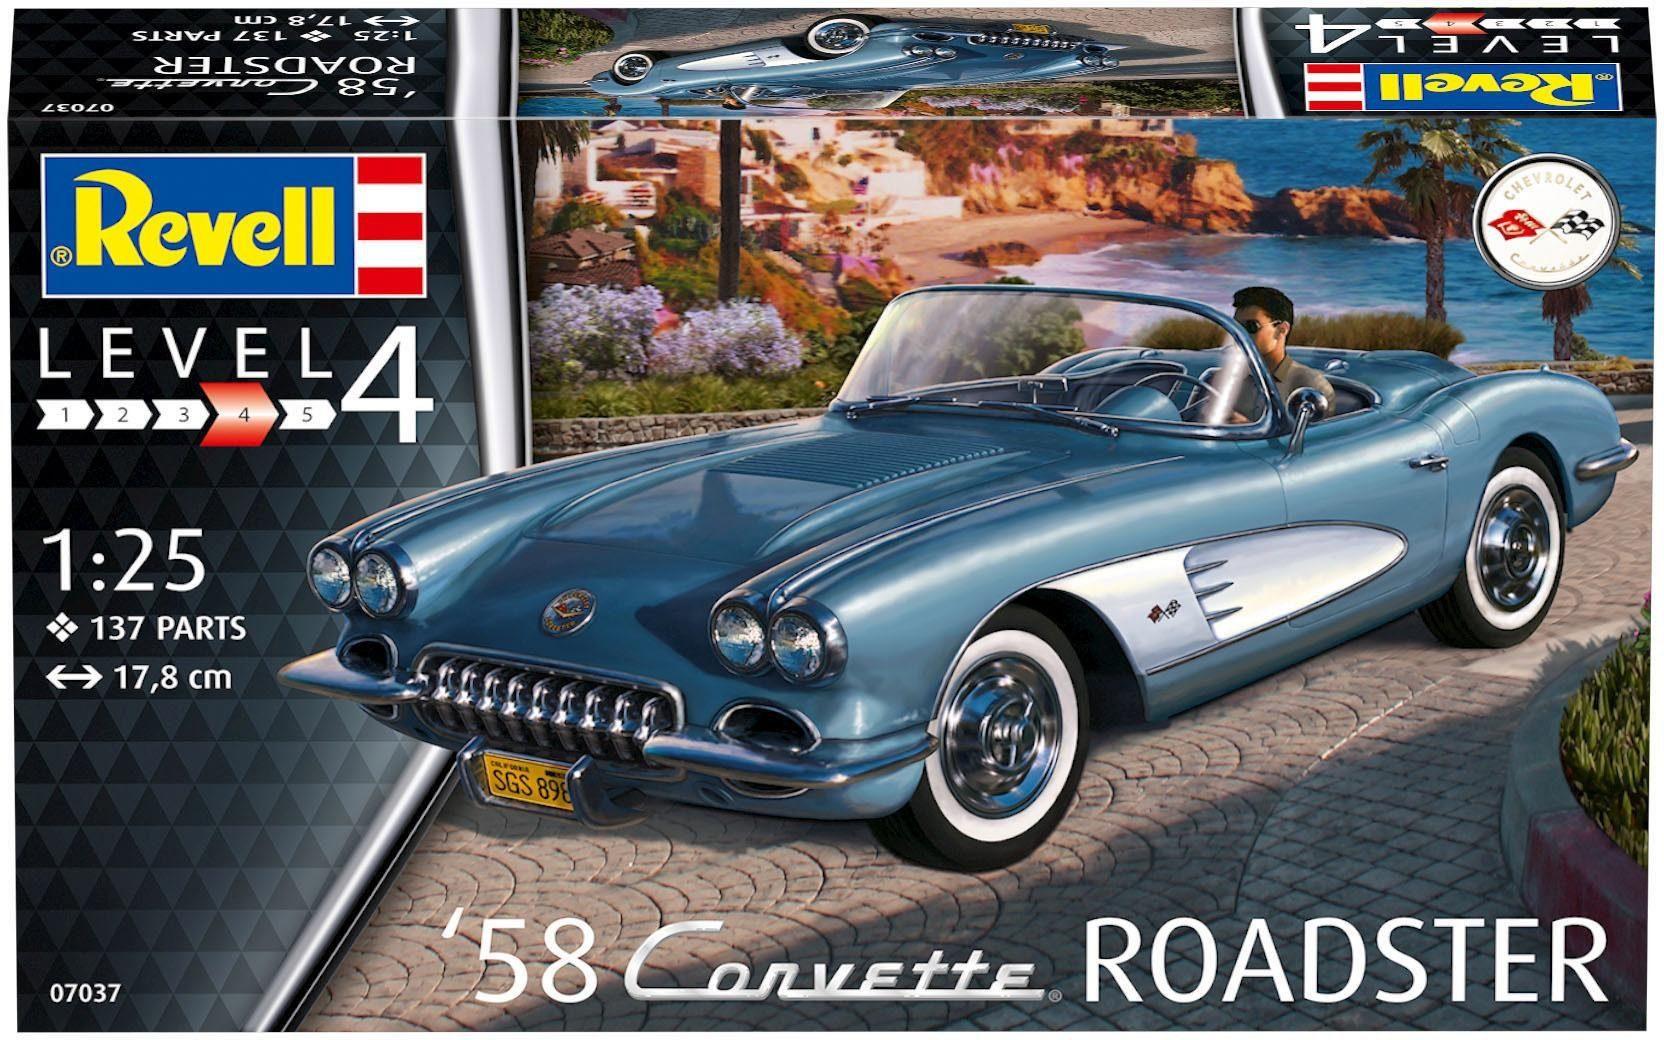 Revell Modellbausatz Auto mit Zubehör Maßstab 1:25, »Model Set '58 Corvette Roadster«